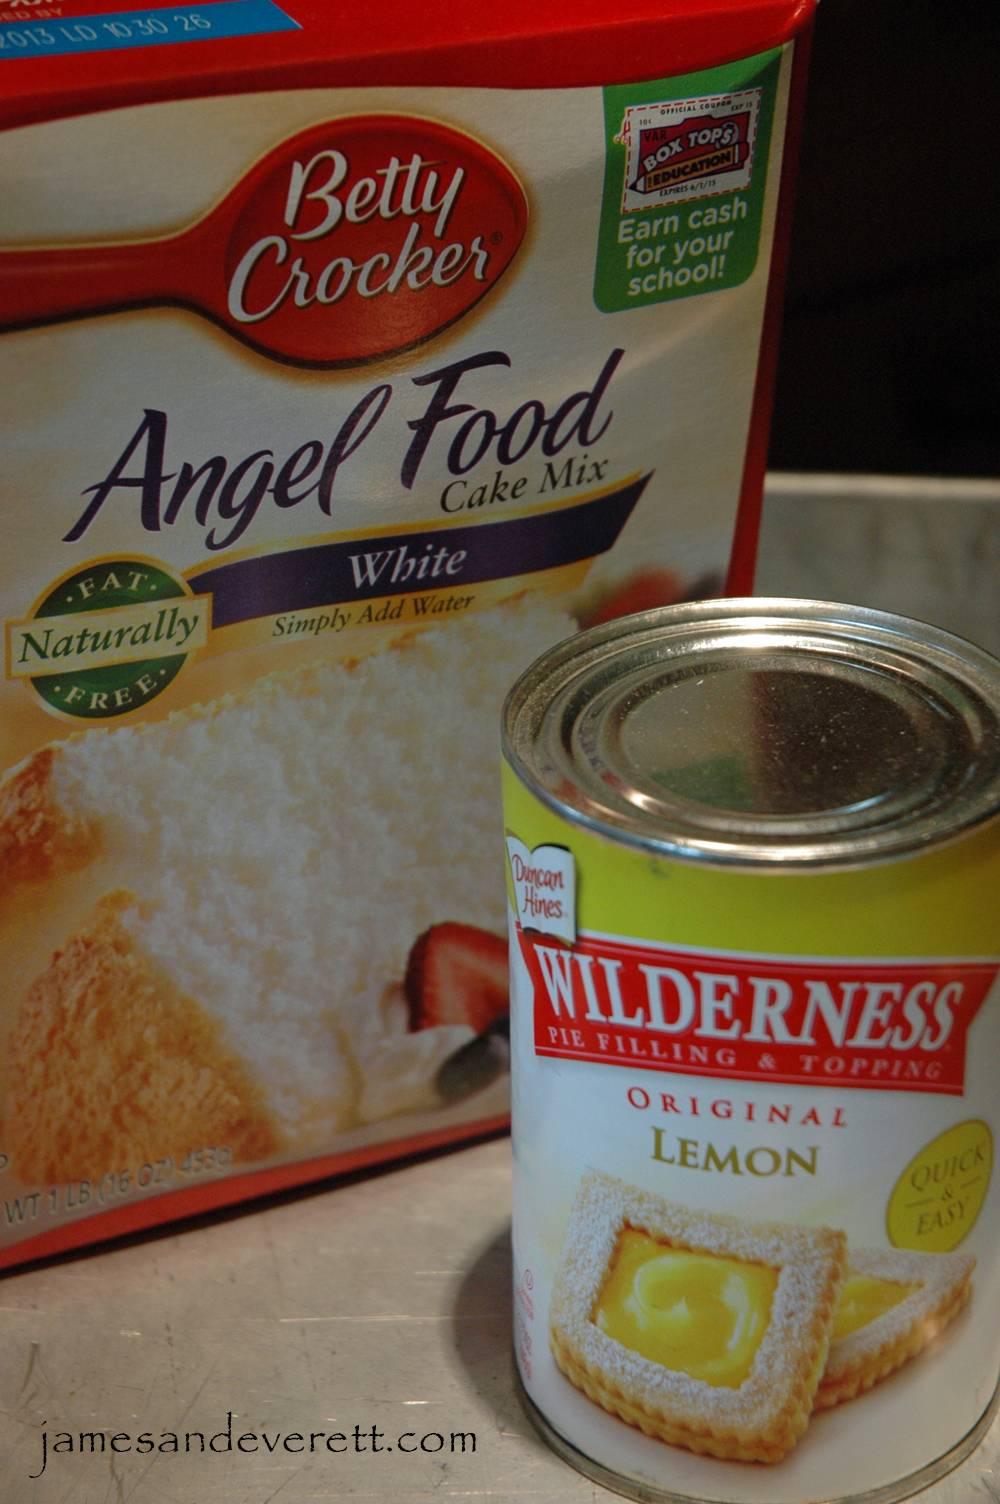 Wilderness Lemon Pie Filling Recipes